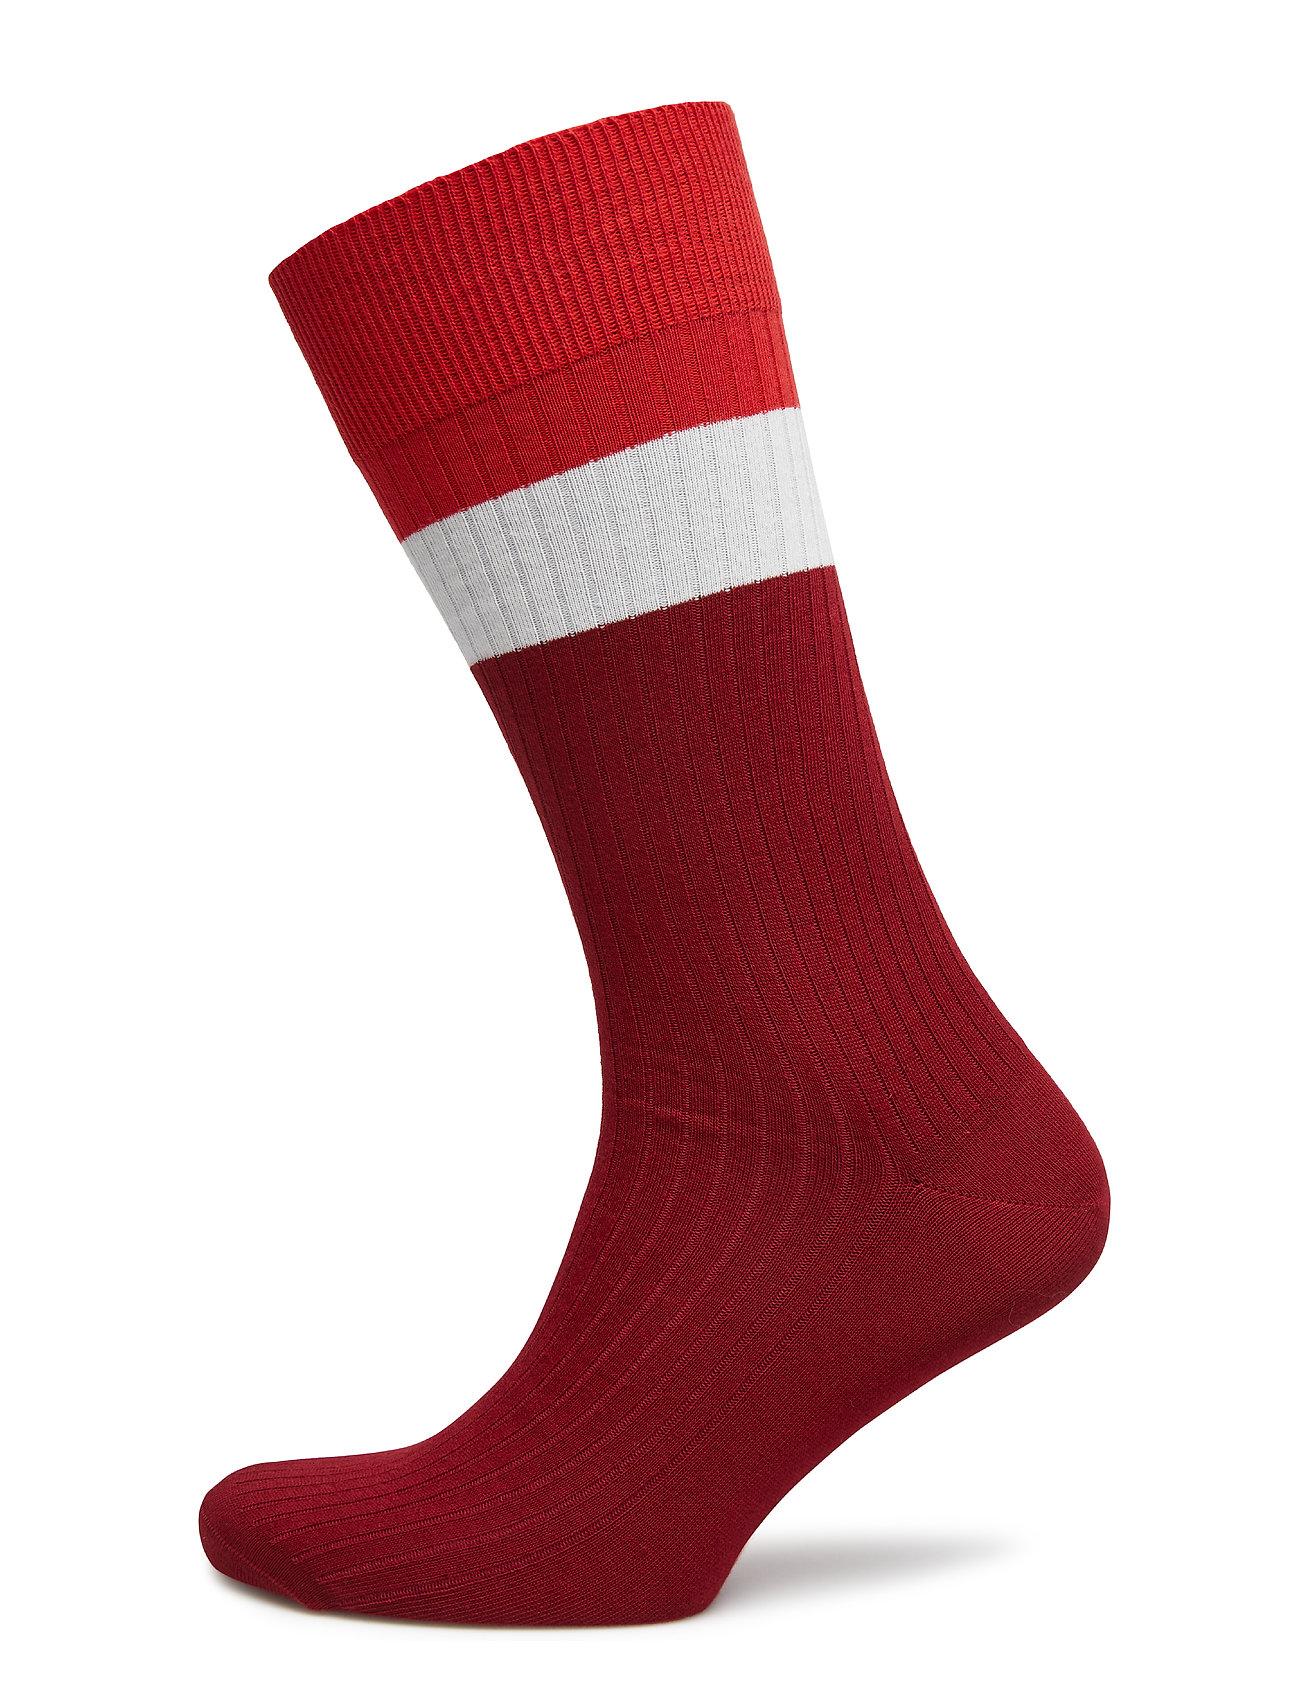 Gant O1. BLOCK COLOR RIB SOCKS - MAHOGNY RED